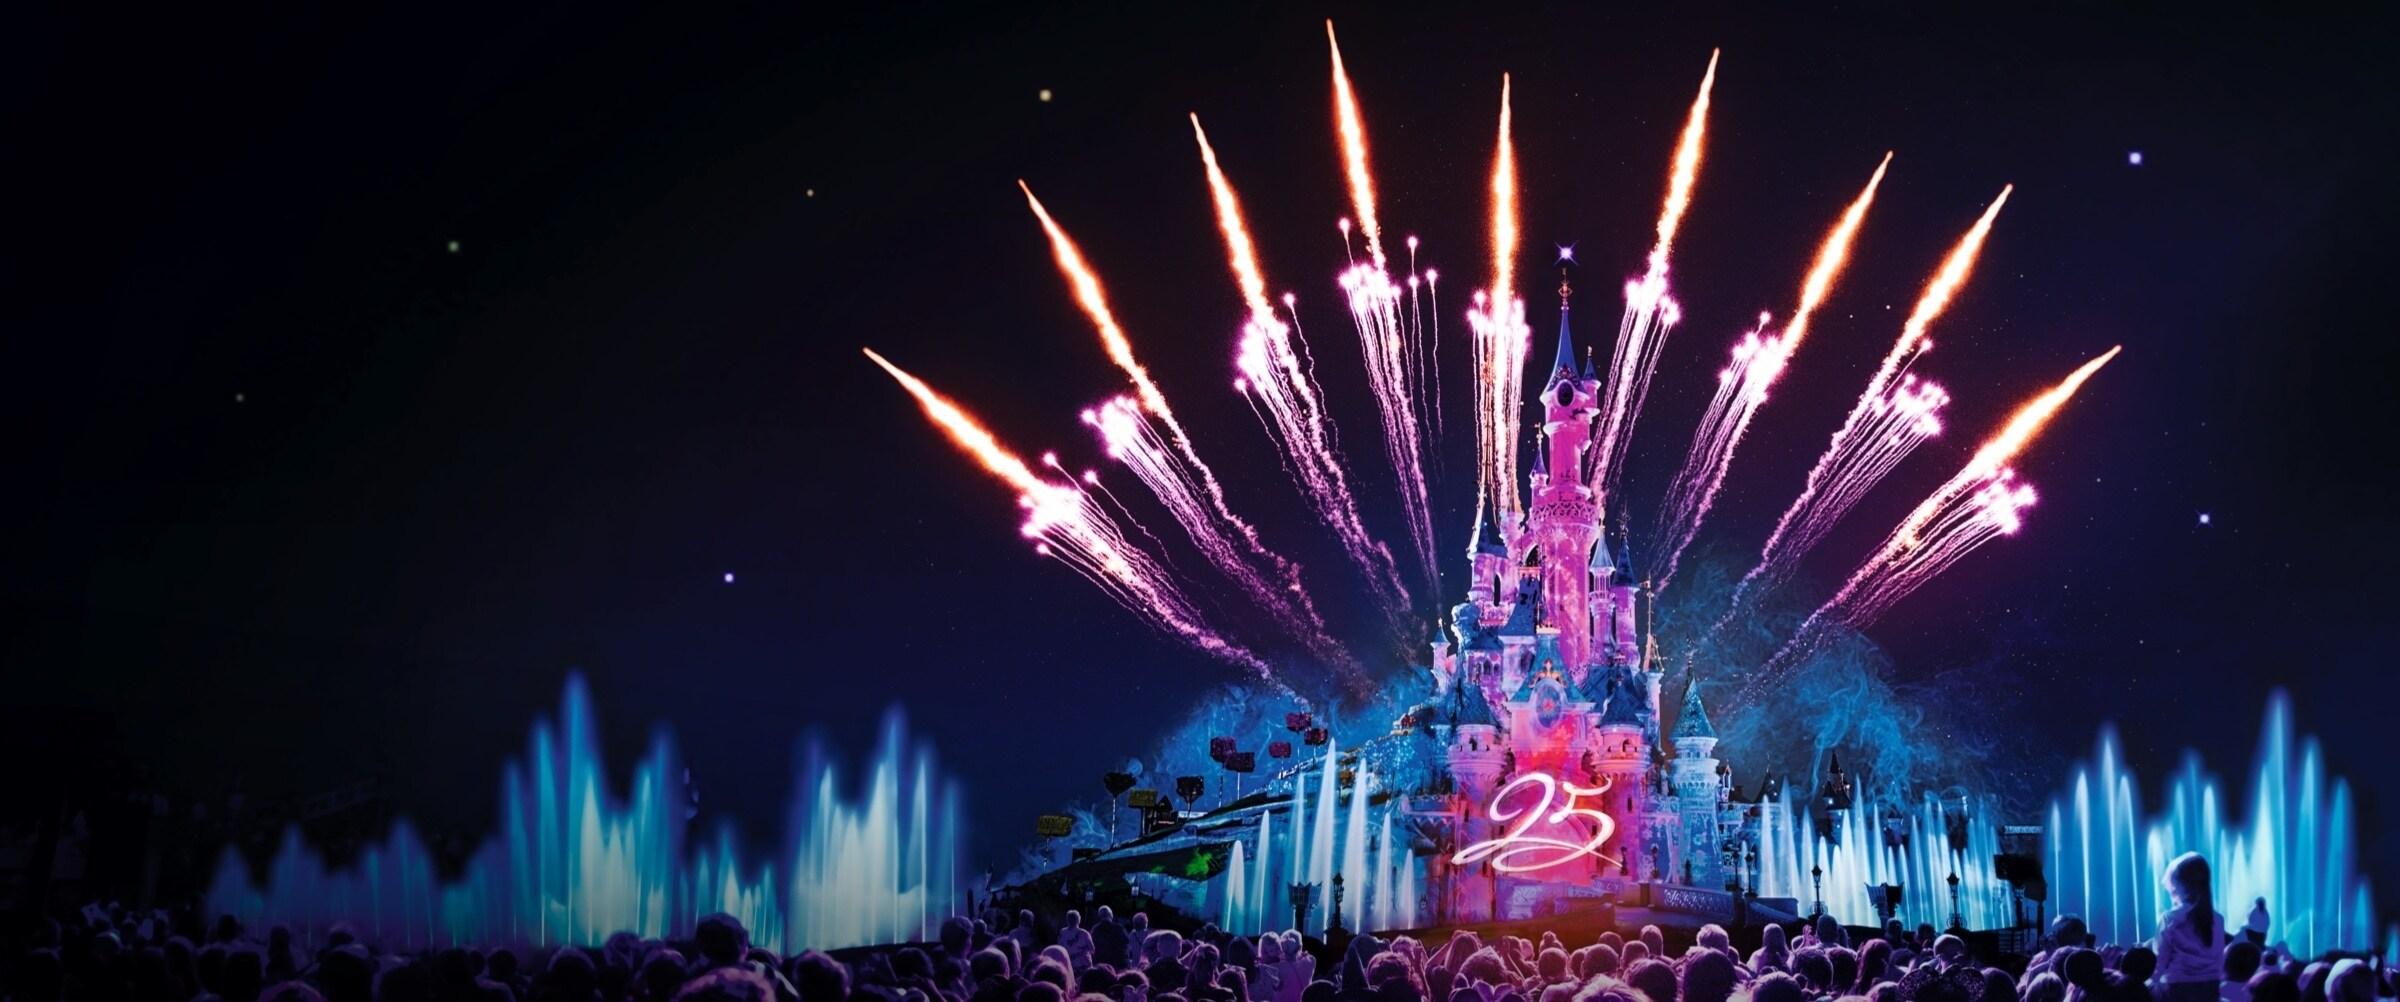 Disneyland Paris | 25th anniversary finale